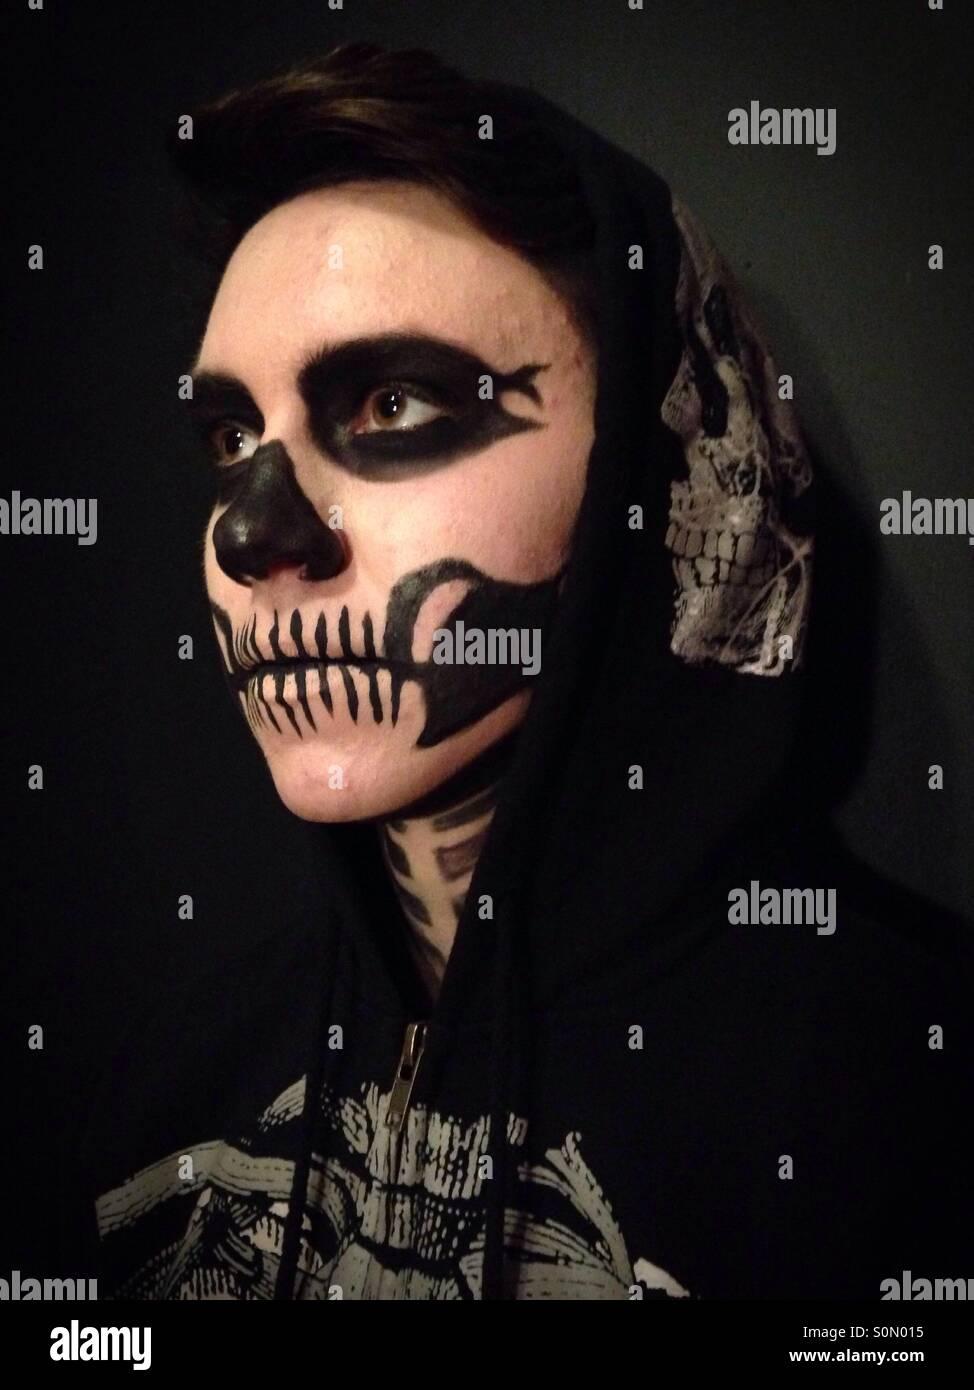 A person wearing skeleton make-up. - Stock Image